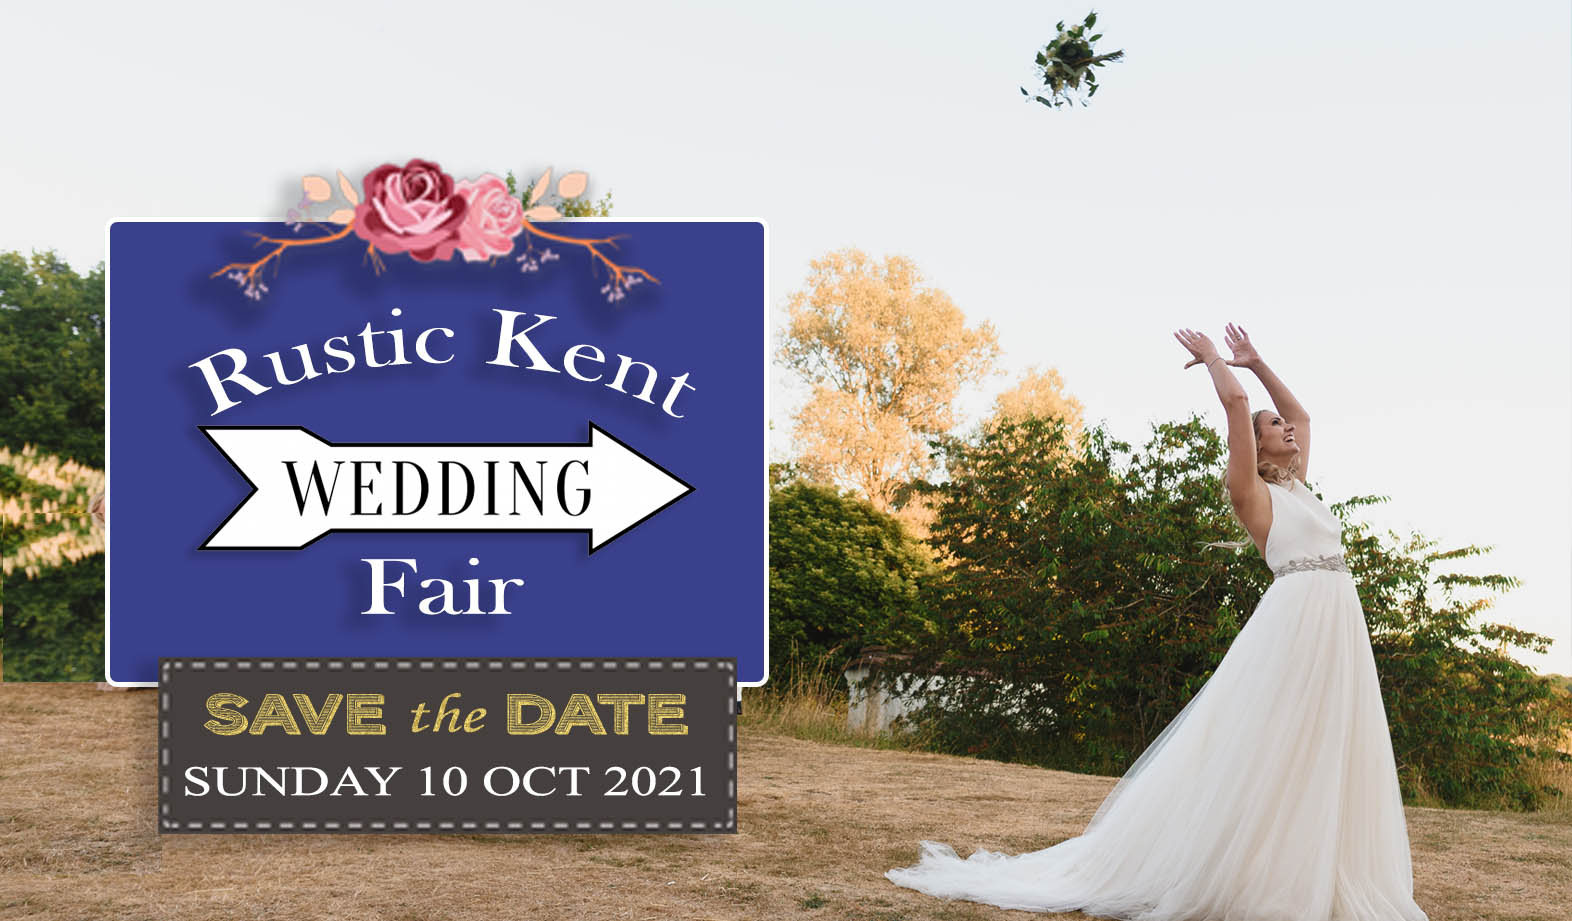 Rustic Kent Wedding - Sunday 10 October 2021